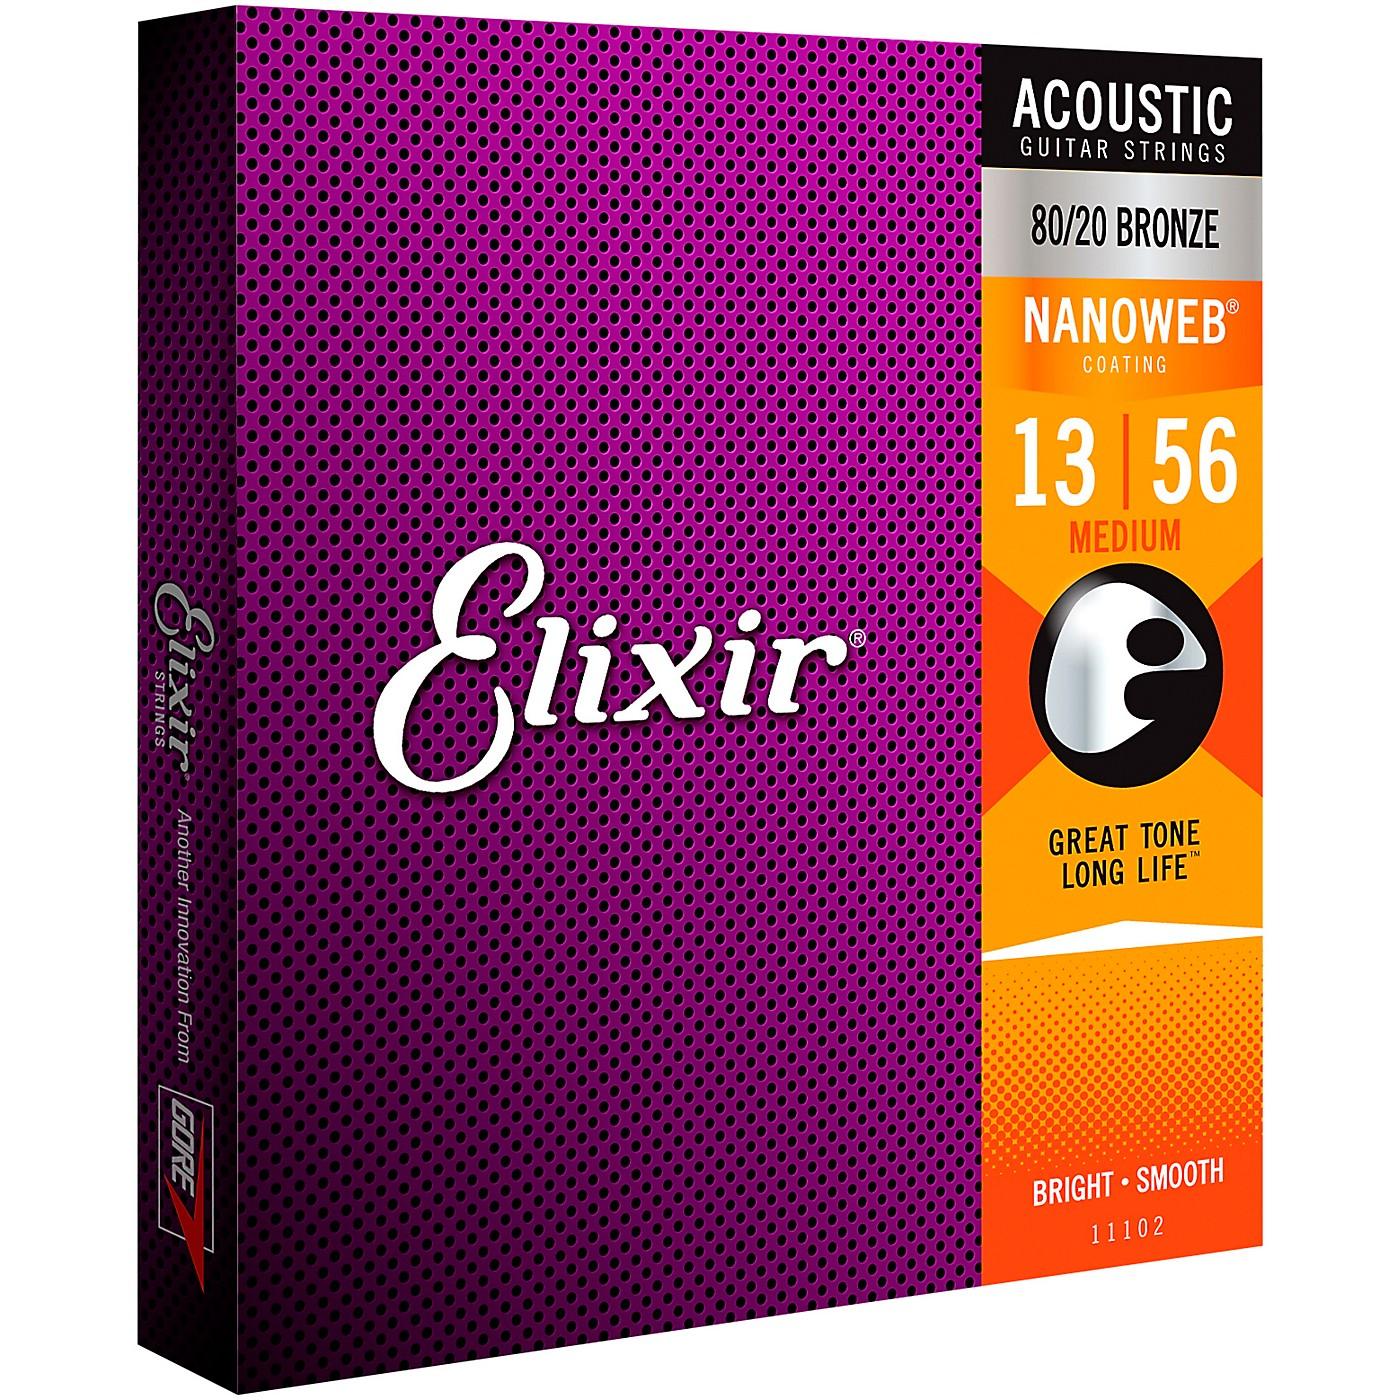 Elixir 80/20 Bronze Acoustic Guitar Strings with NANOWEB Coating, Medium (.013-.056) thumbnail